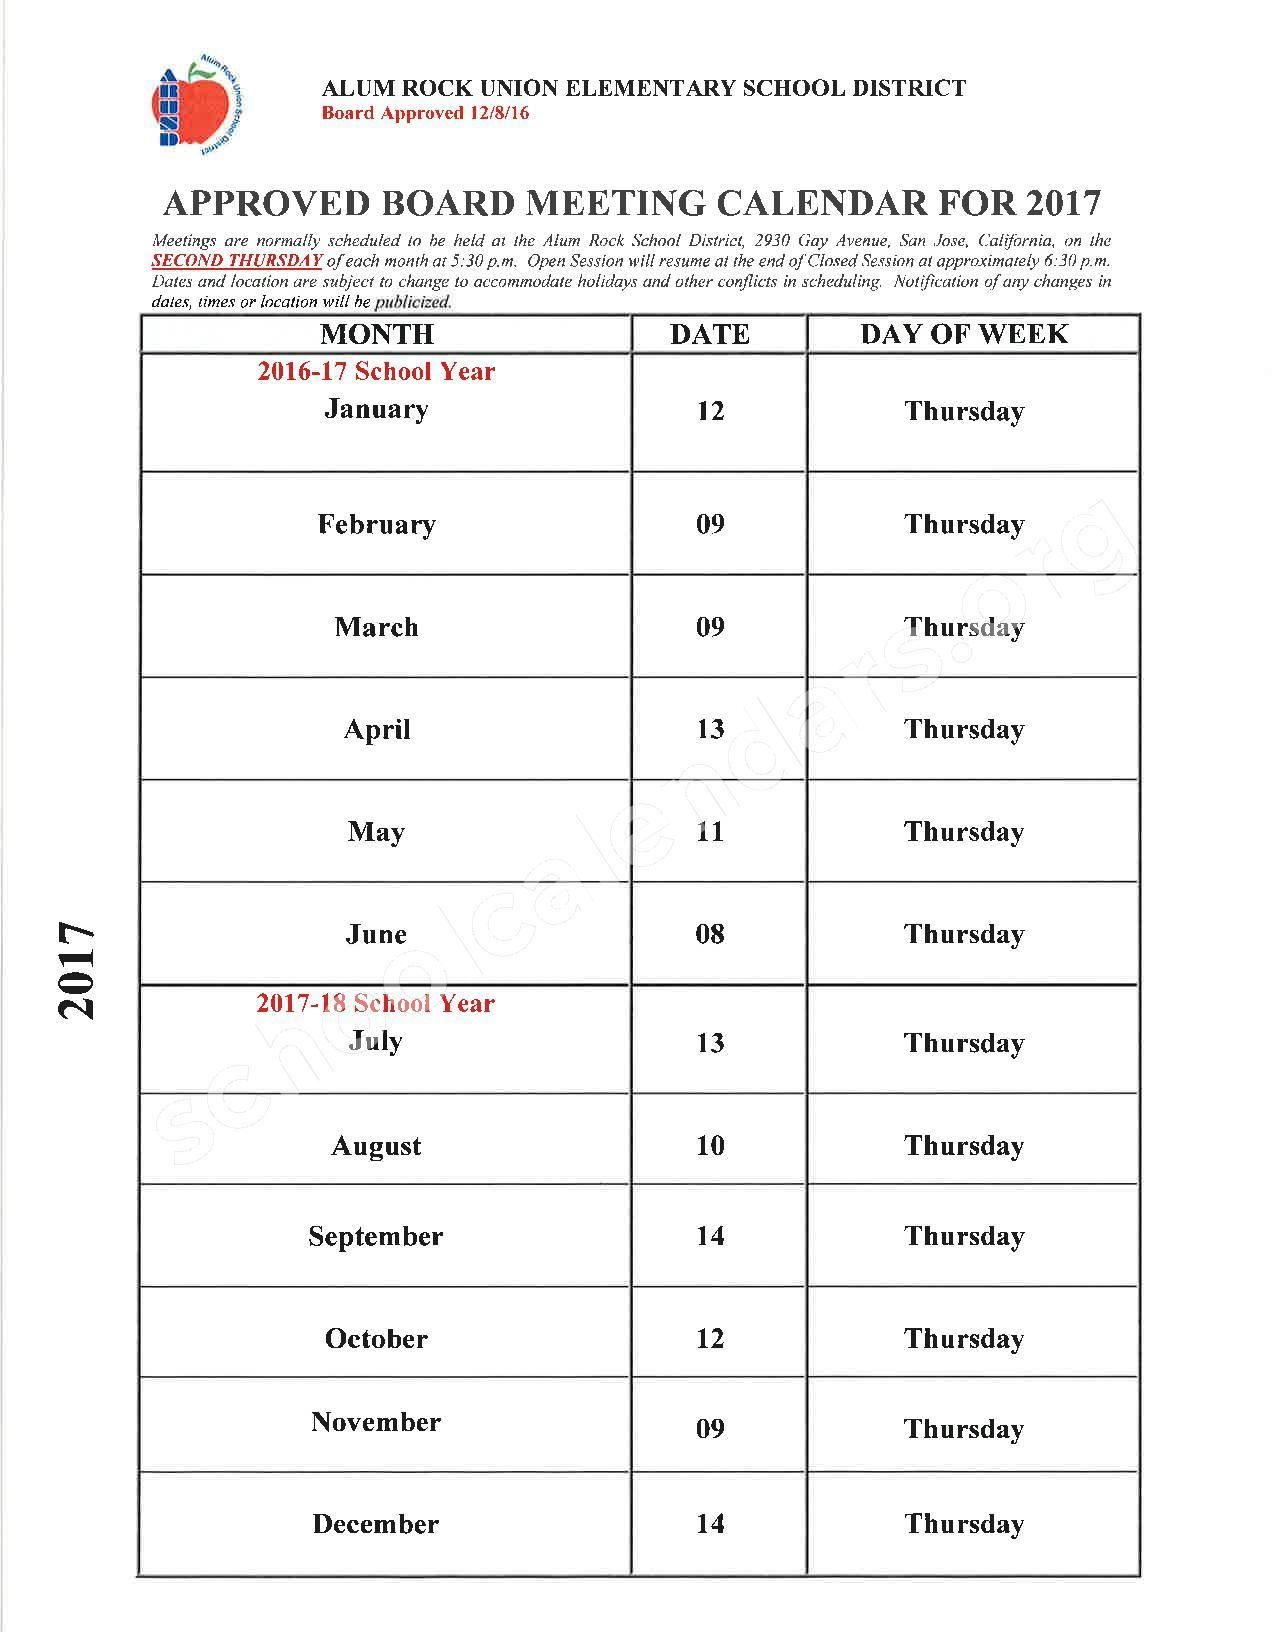 2017 School Board Meeting Calendar – Alum Rock Union Elementary School District – page 1